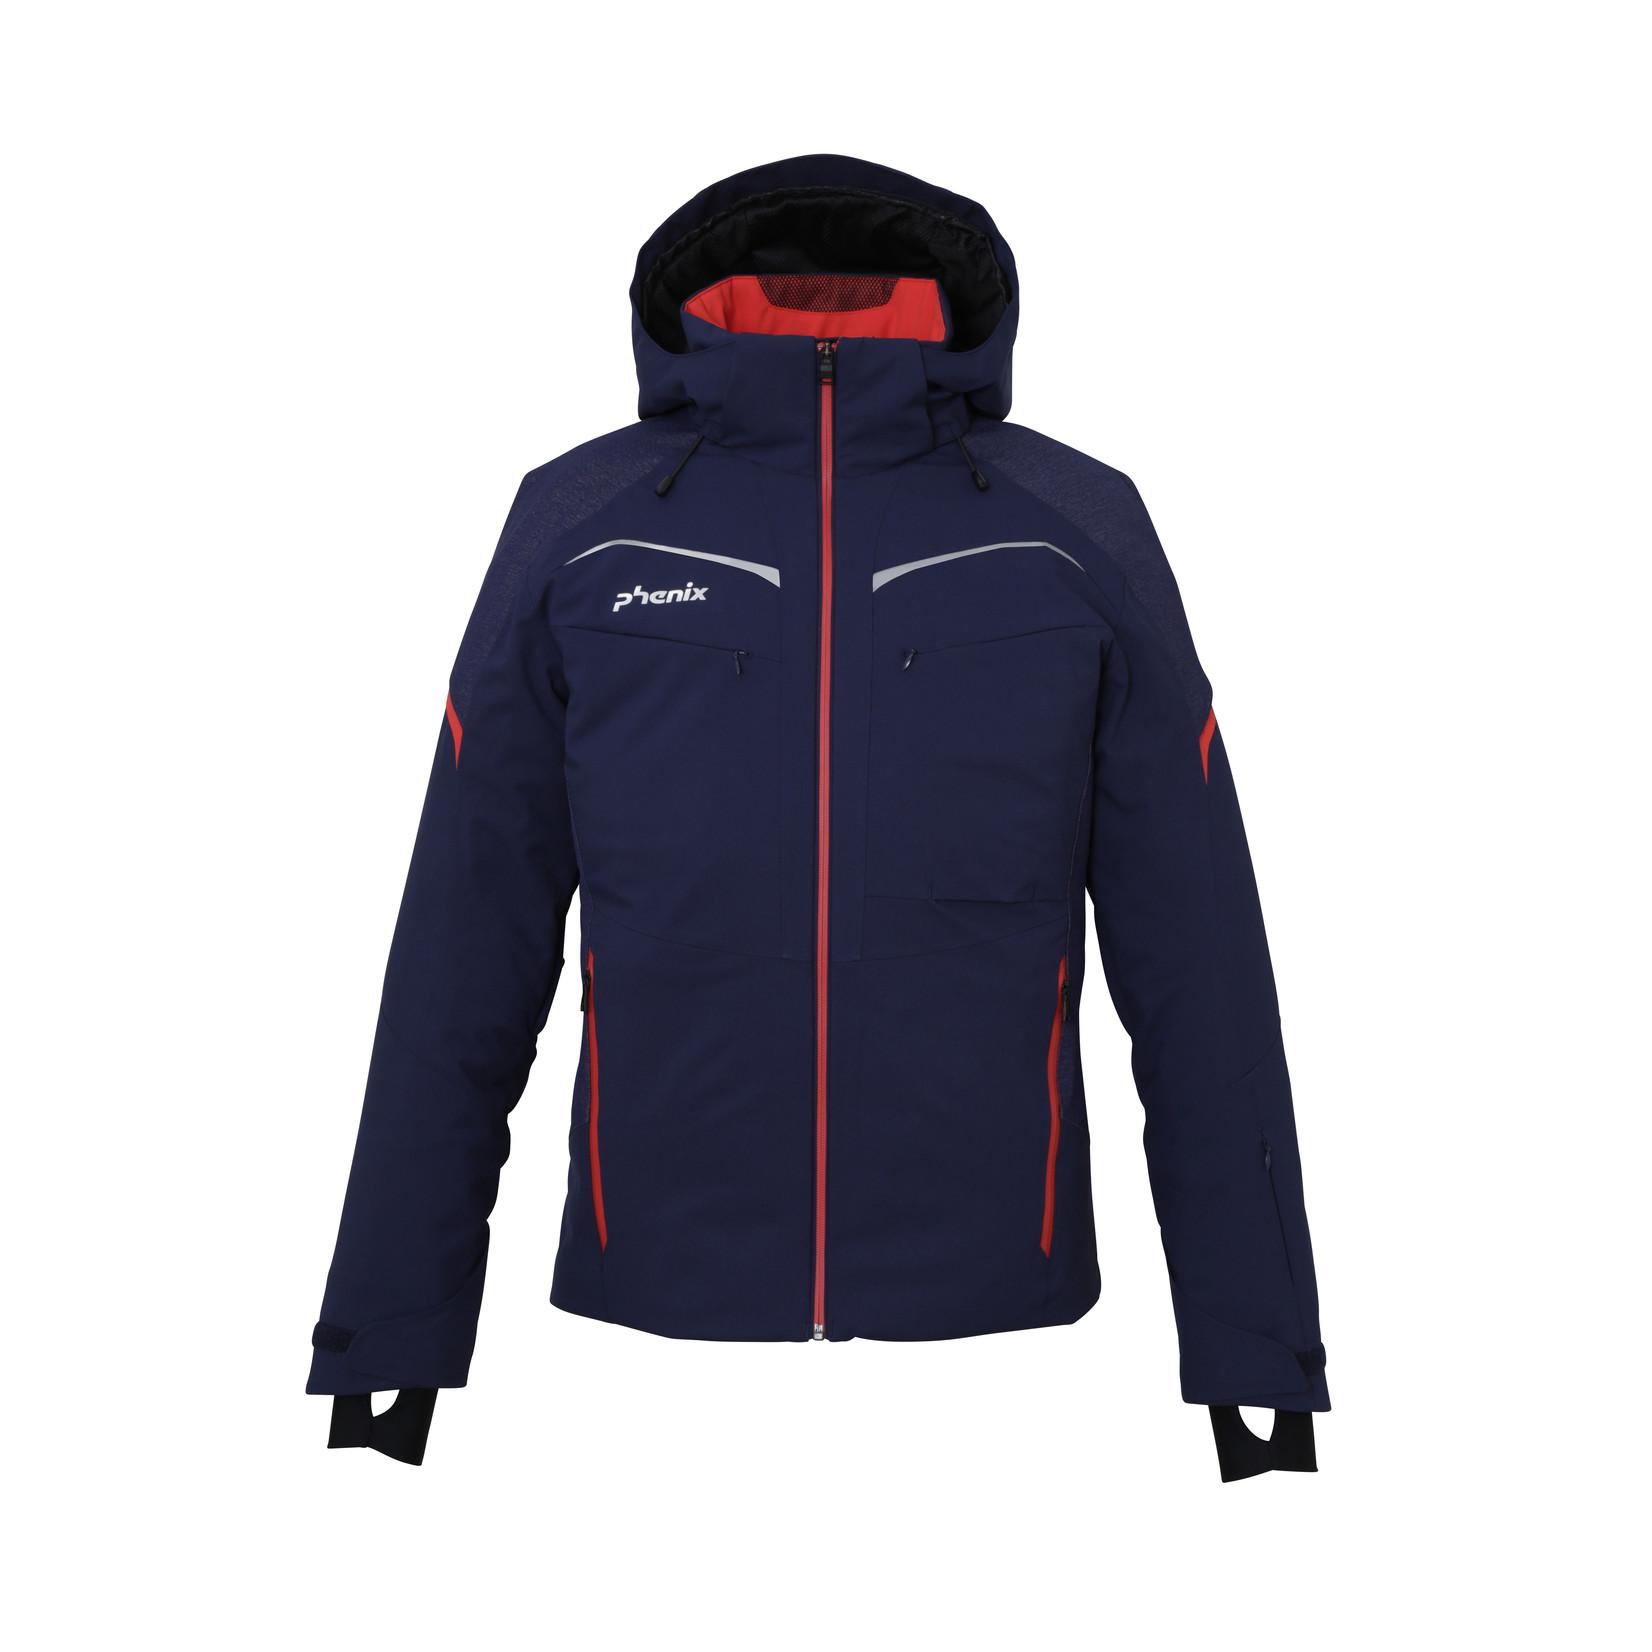 PHENIX Raptor Jacket